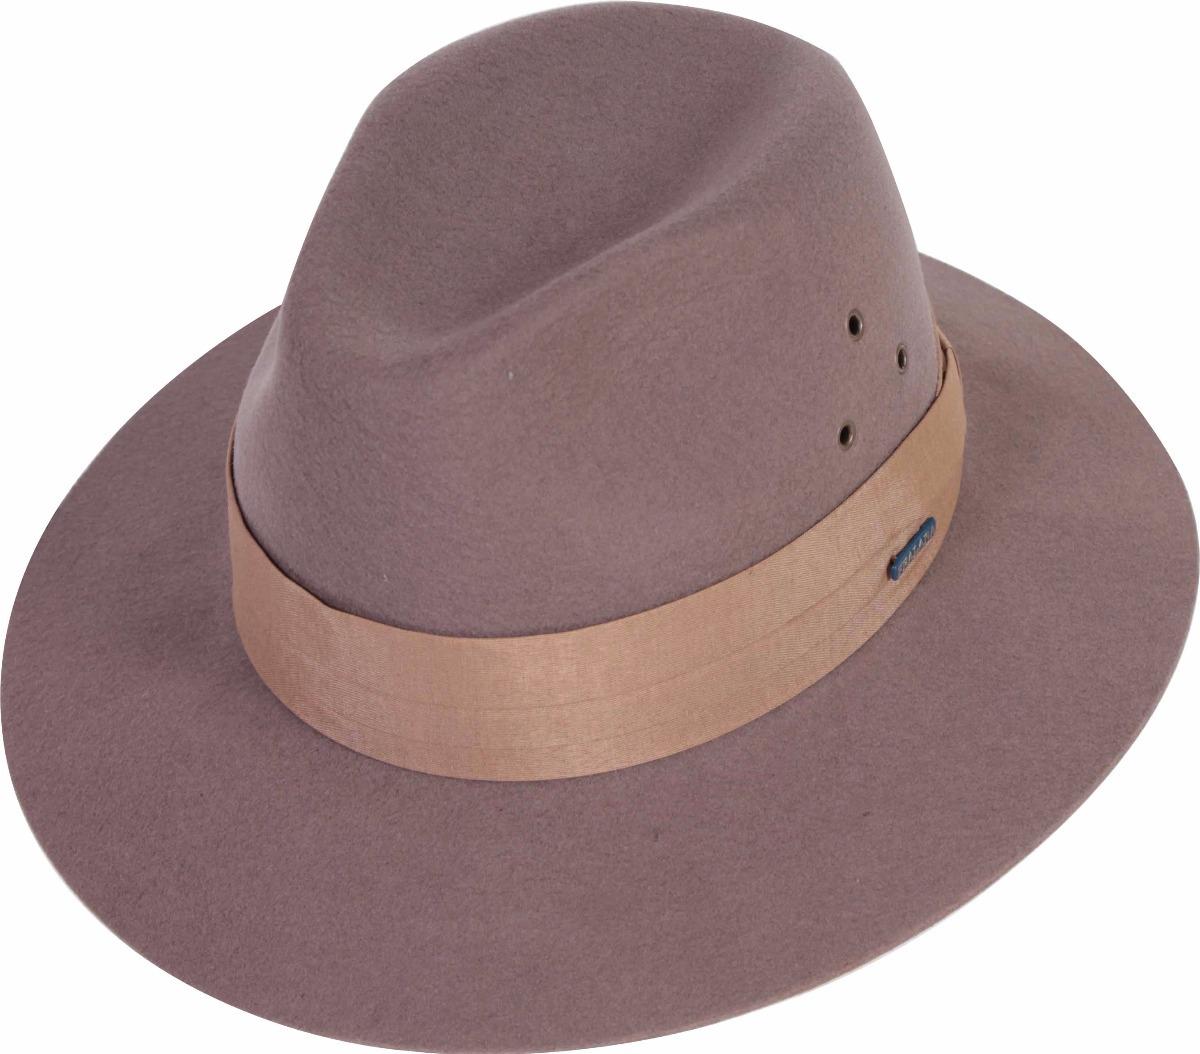 chapéu pralana legitimo lebre castor safari social indy 5x. Carregando zoom. c247cd8e3af